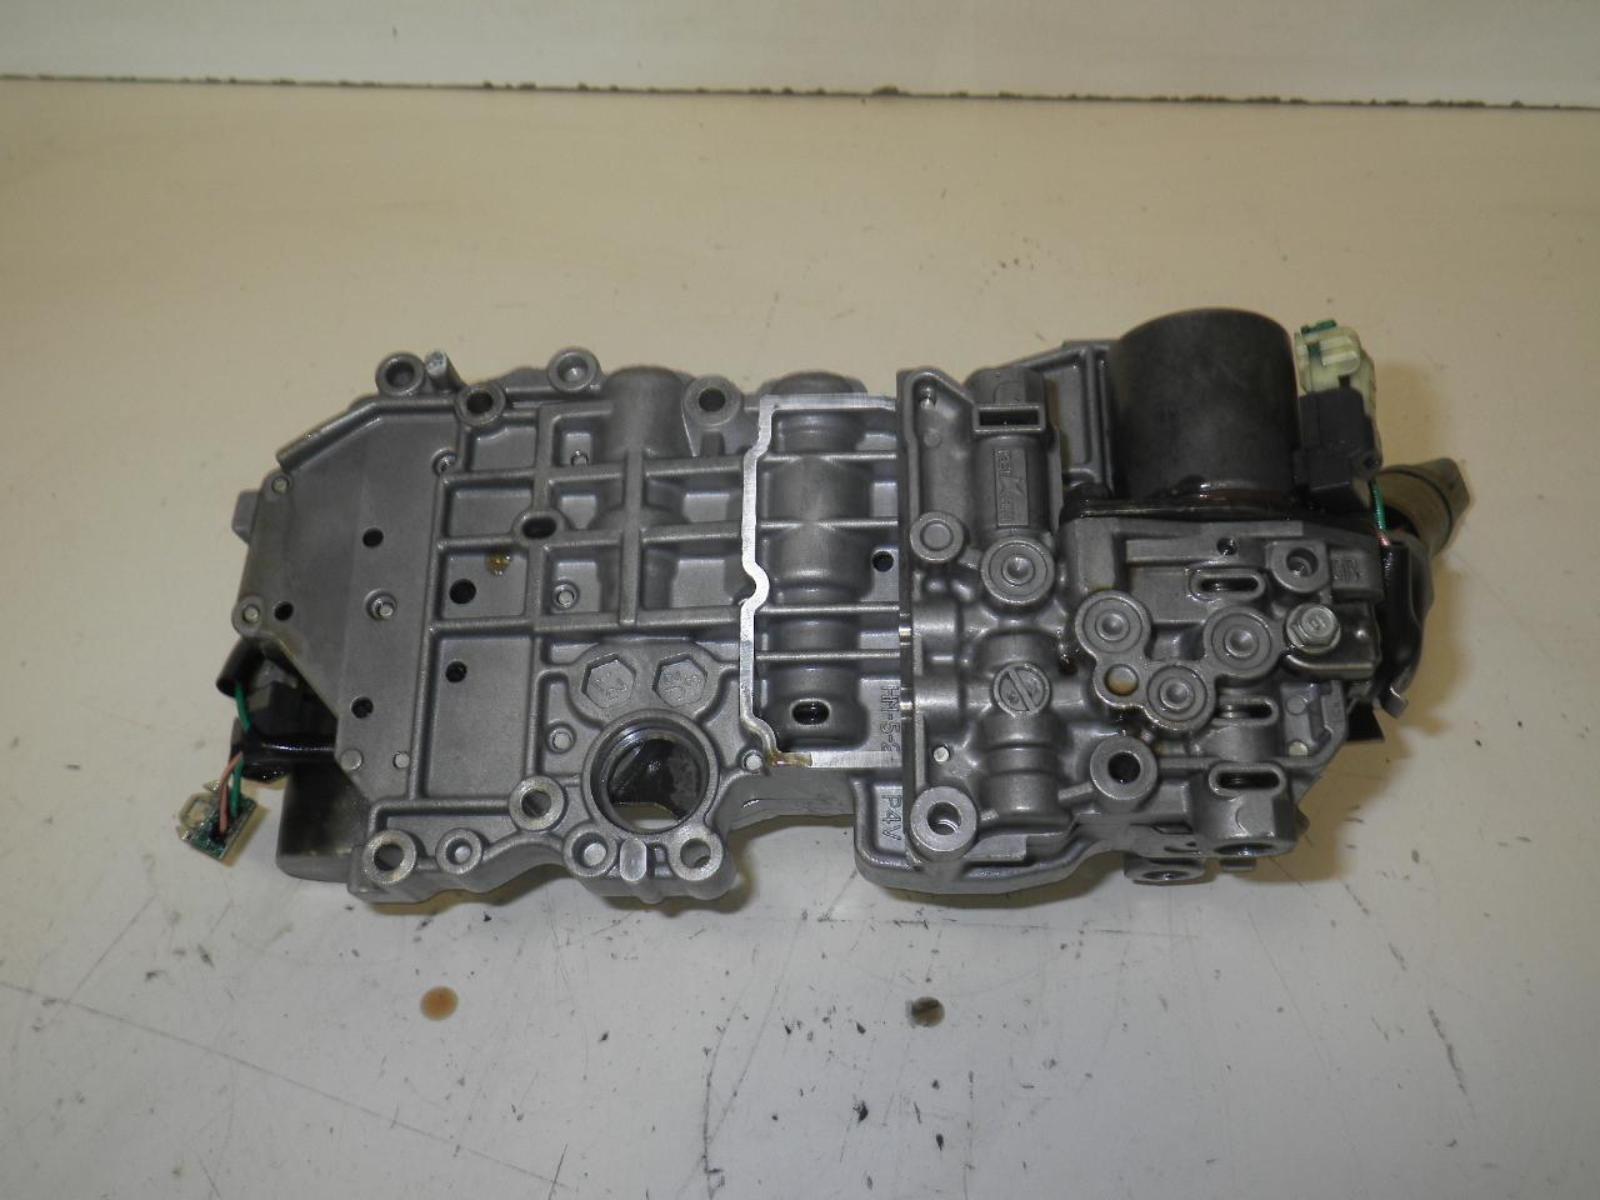 Details about HONDA CIVIC Transmission Valve Body 99-00, 27000P4V030